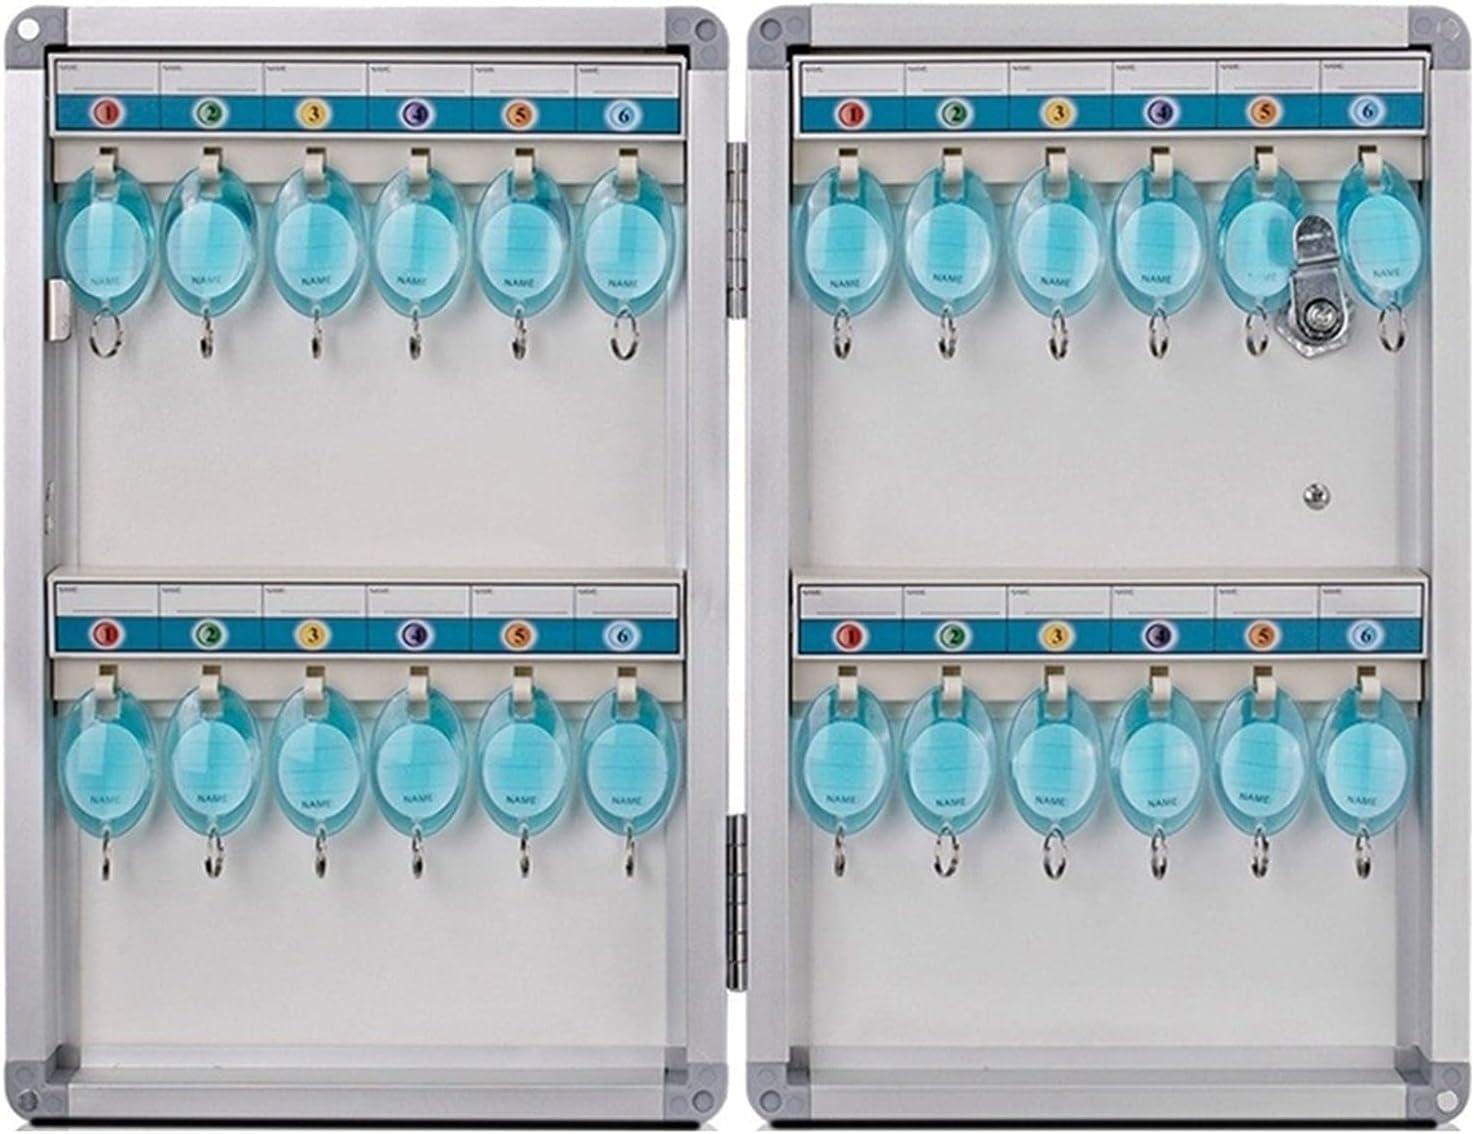 LICGHONG Key Safe 35% OFF Box Wall service Cabinets Mounted Keys 24 Outdoor